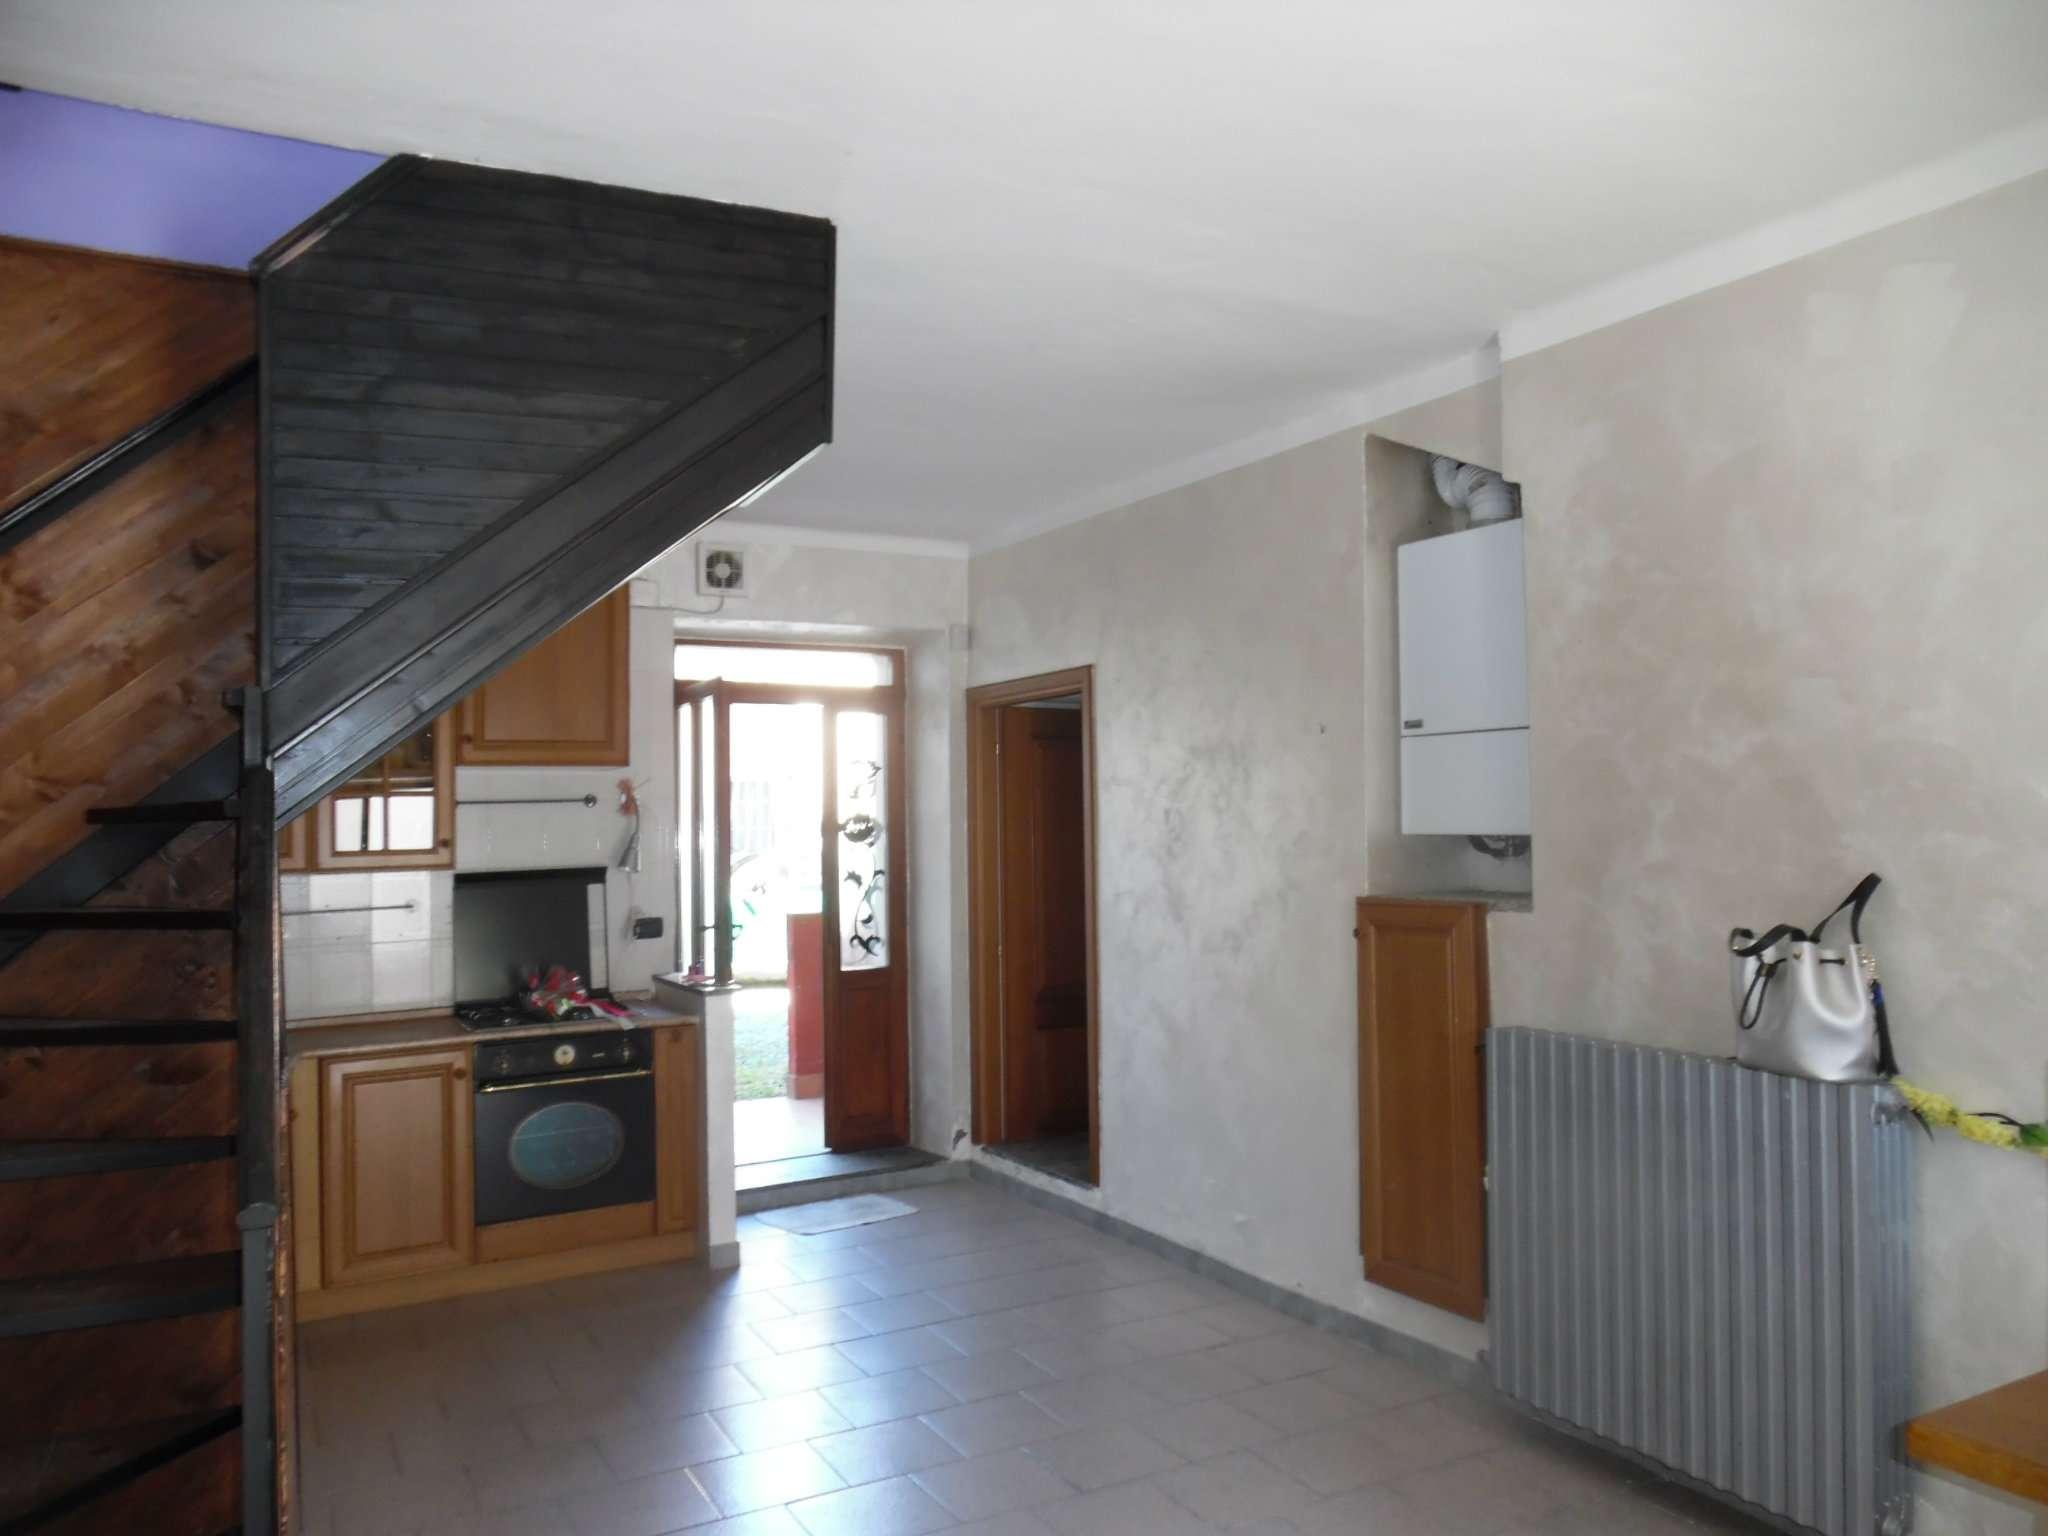 Casa Indipendente in condizioni mediocri in vendita Rif. 7338789